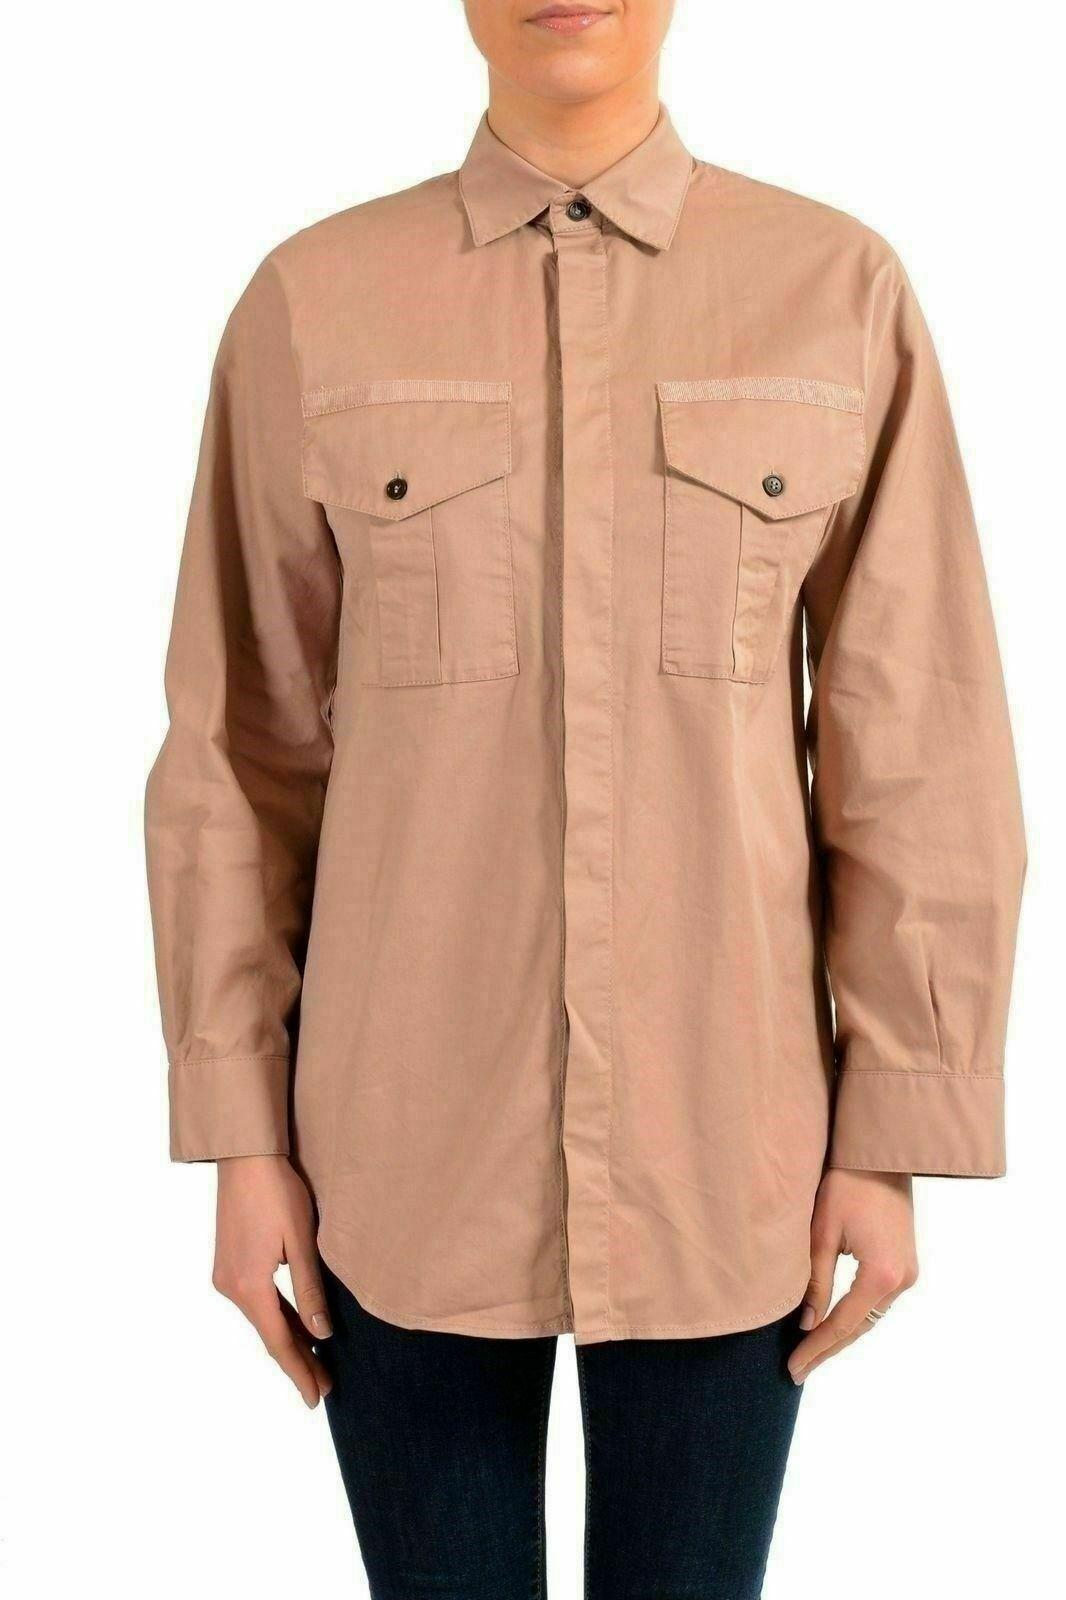 Dsquared2 Women's Beige Long Sleeve Button Down Shirt US XS IT 38